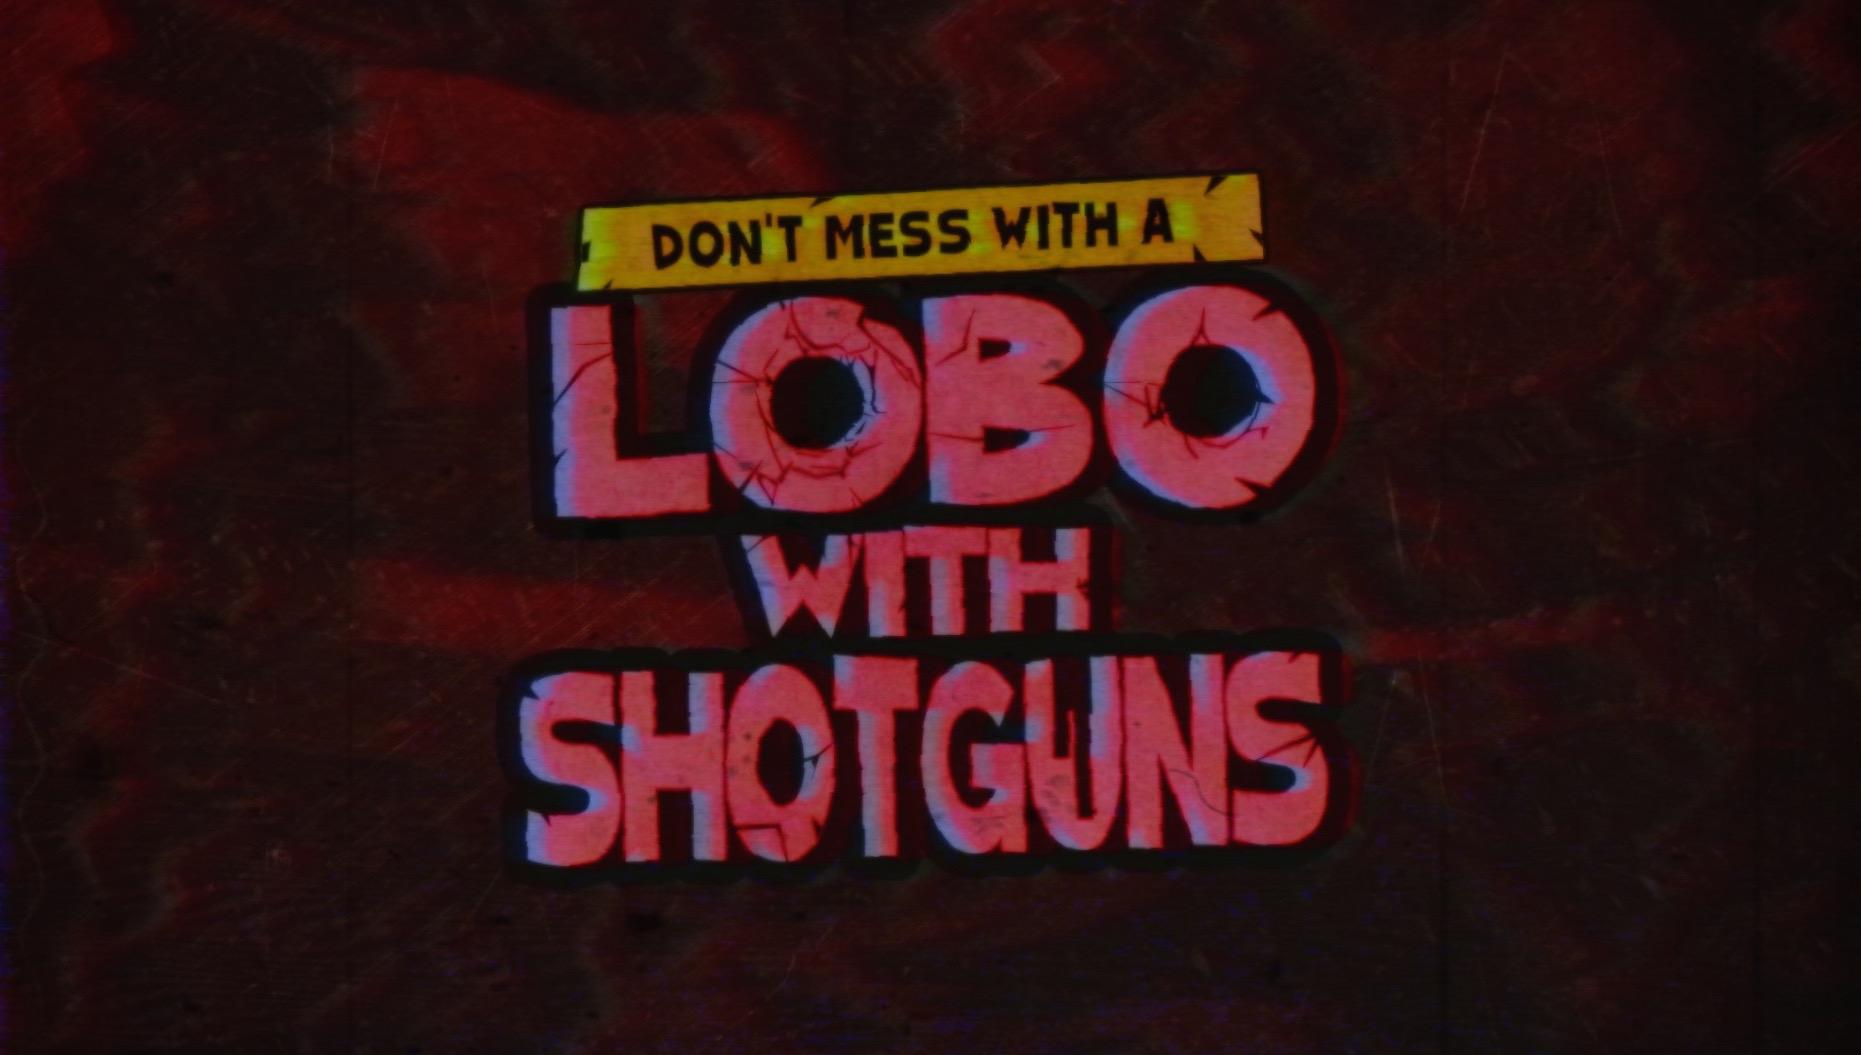 Lobo With Shotguns